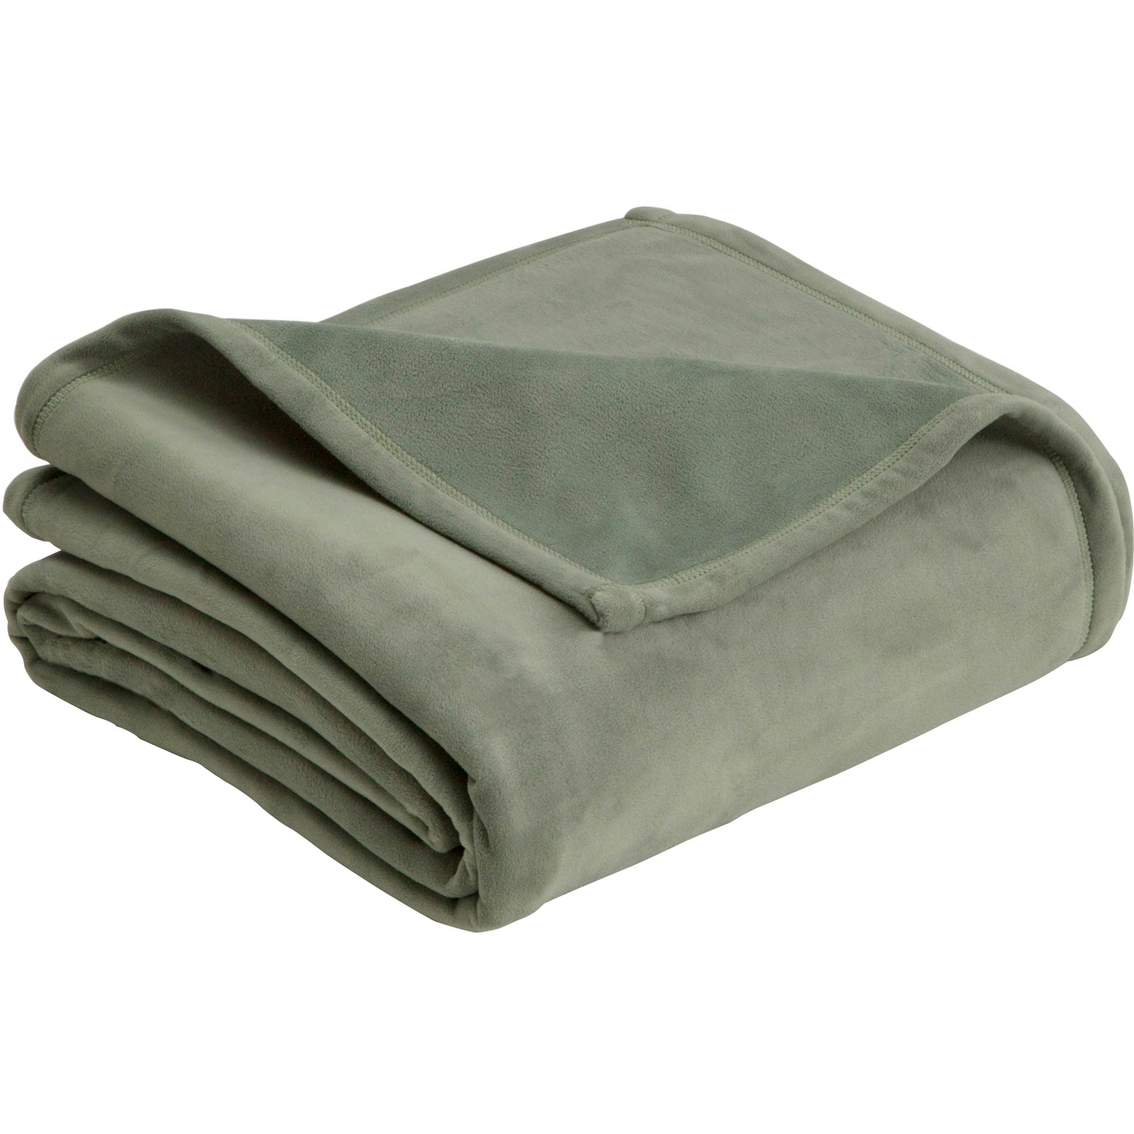 Vellux plush blanket blankets throws home for Vellux blanket